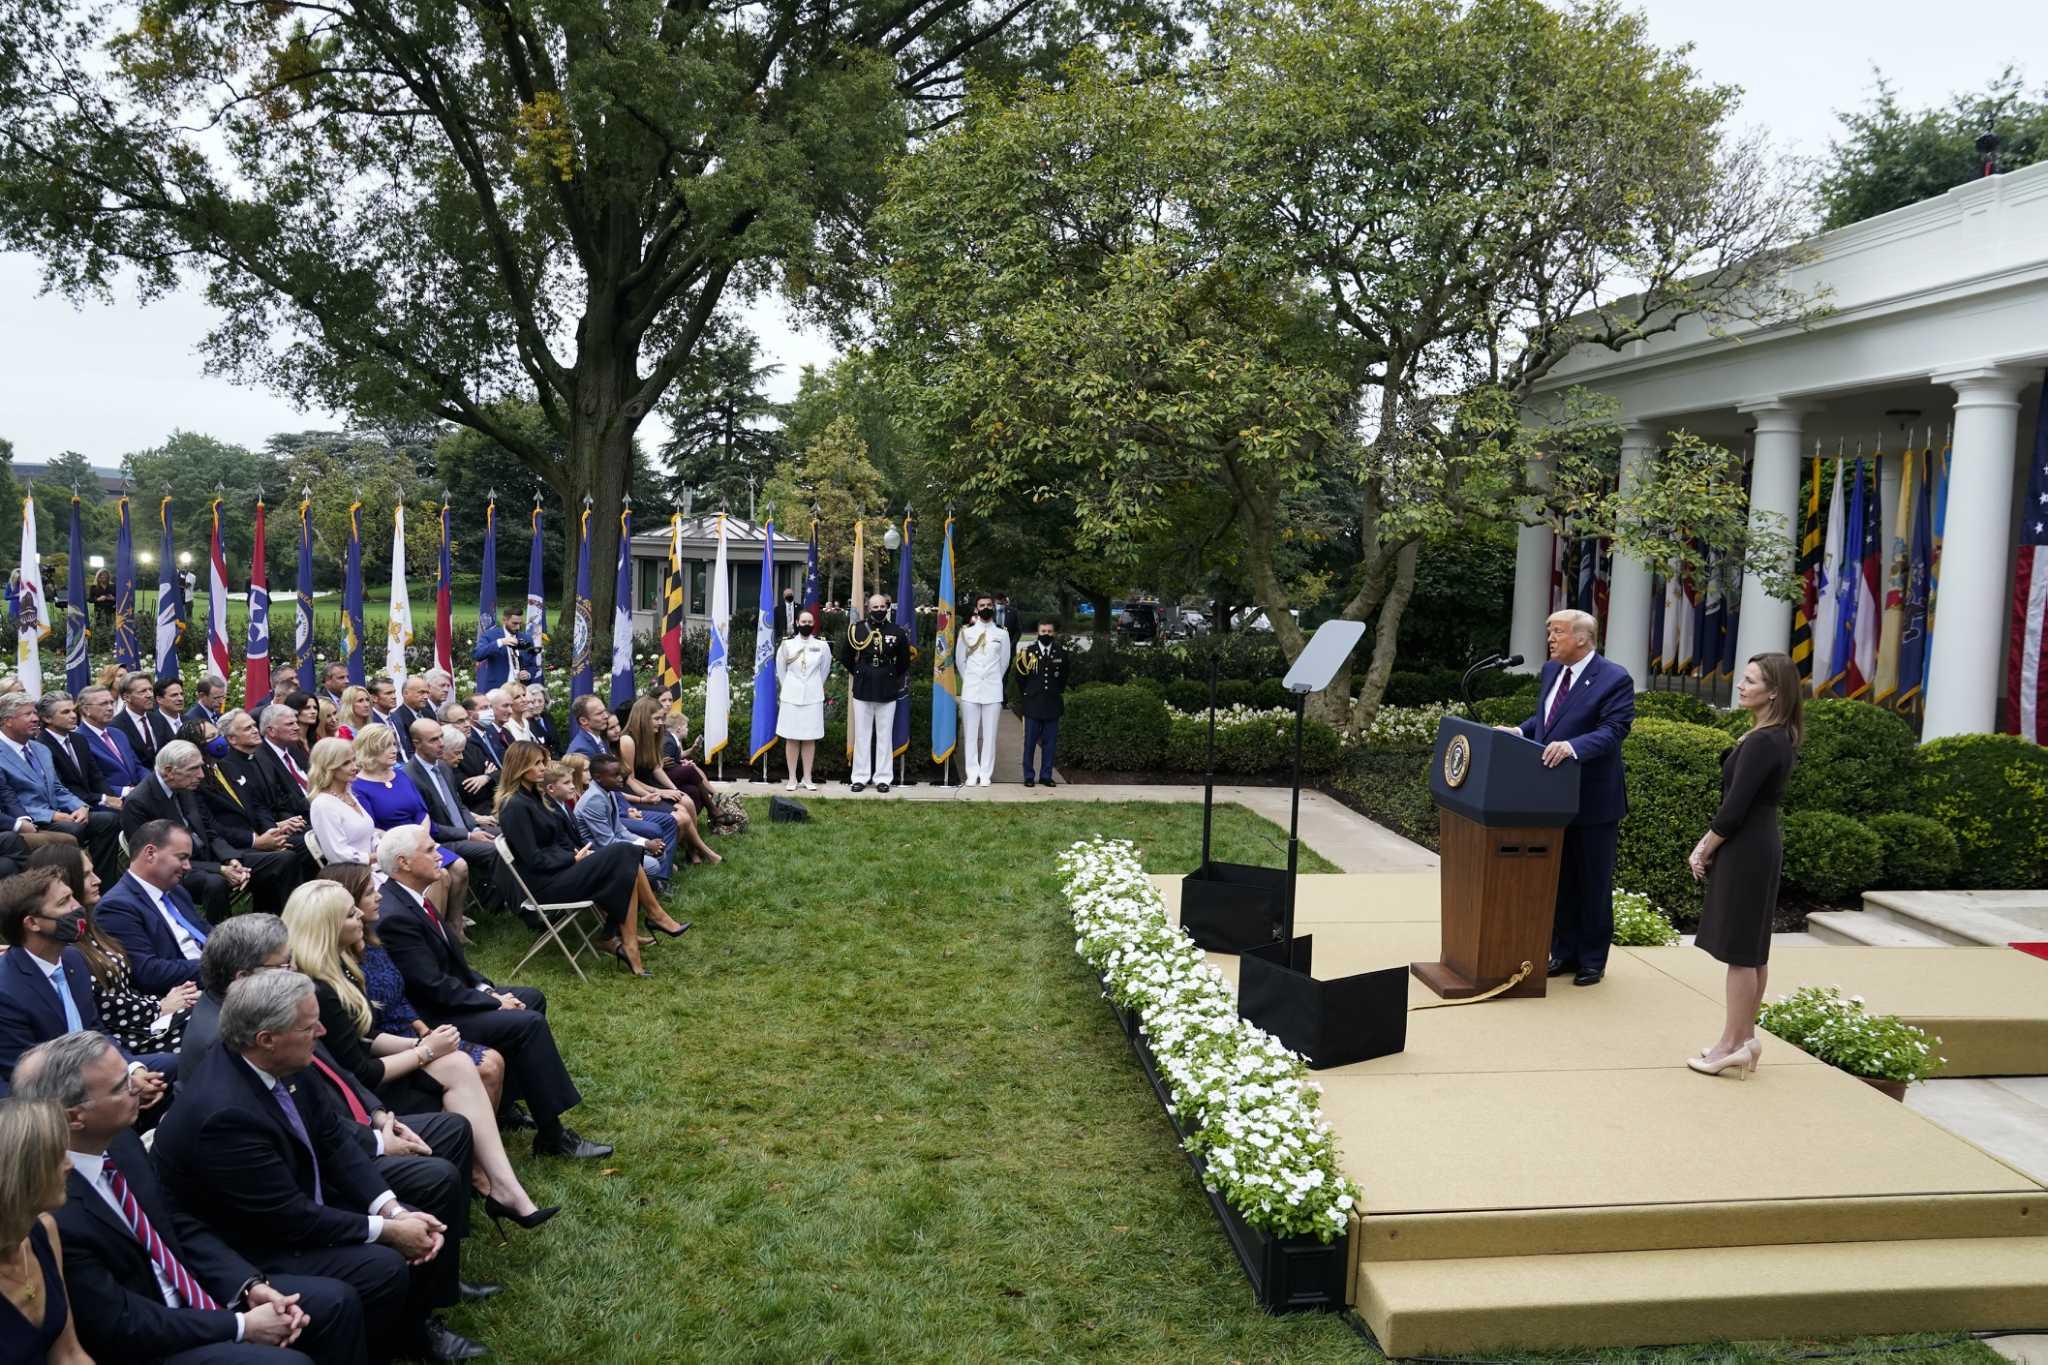 Trump nominates Amy Coney Barrett to the Supreme Court at White House event